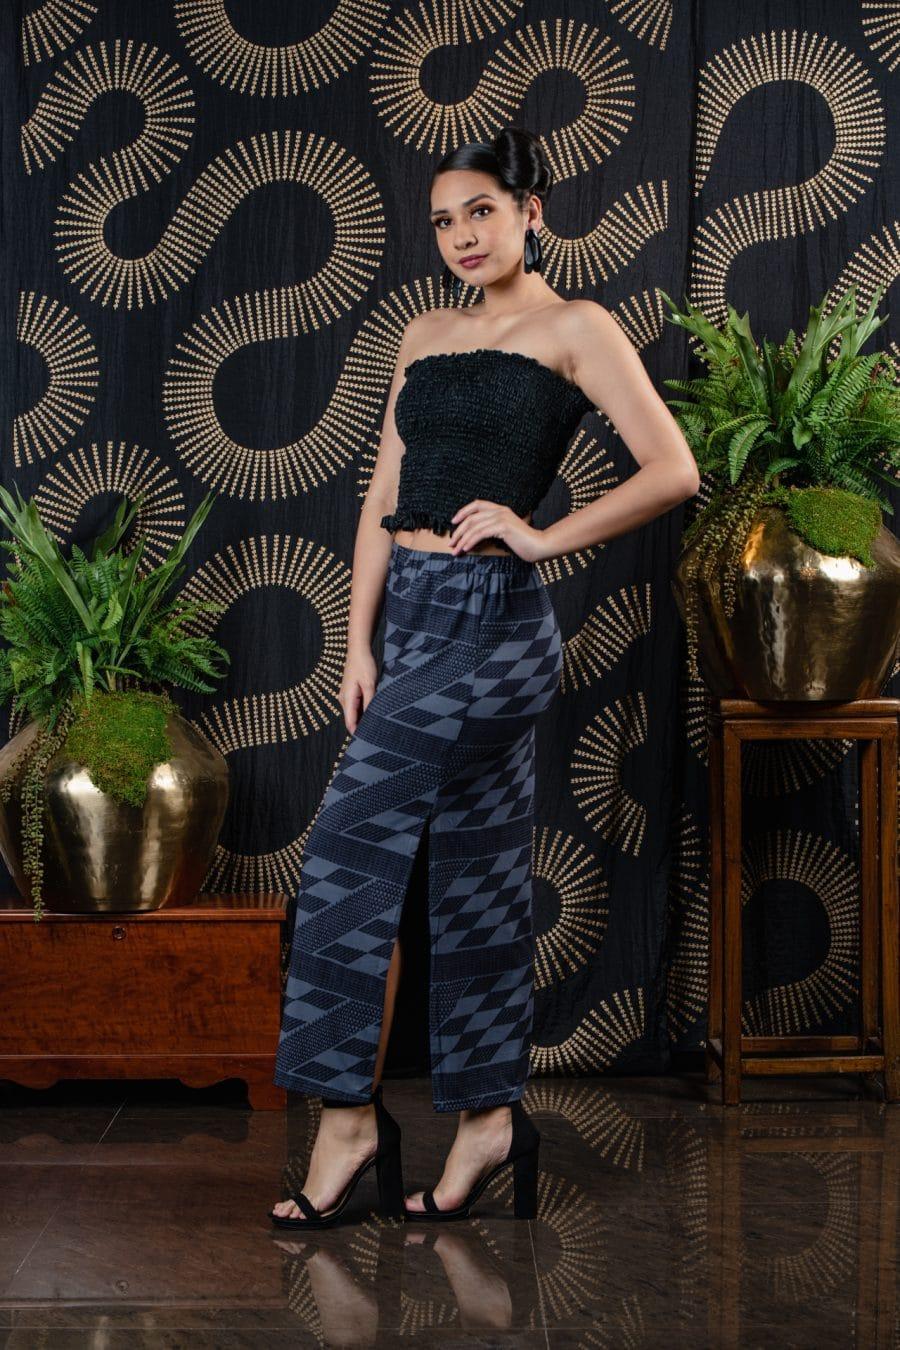 Model wearing Kahiki Skirt in Deepwell/Folkstone Kamehameha - Back View